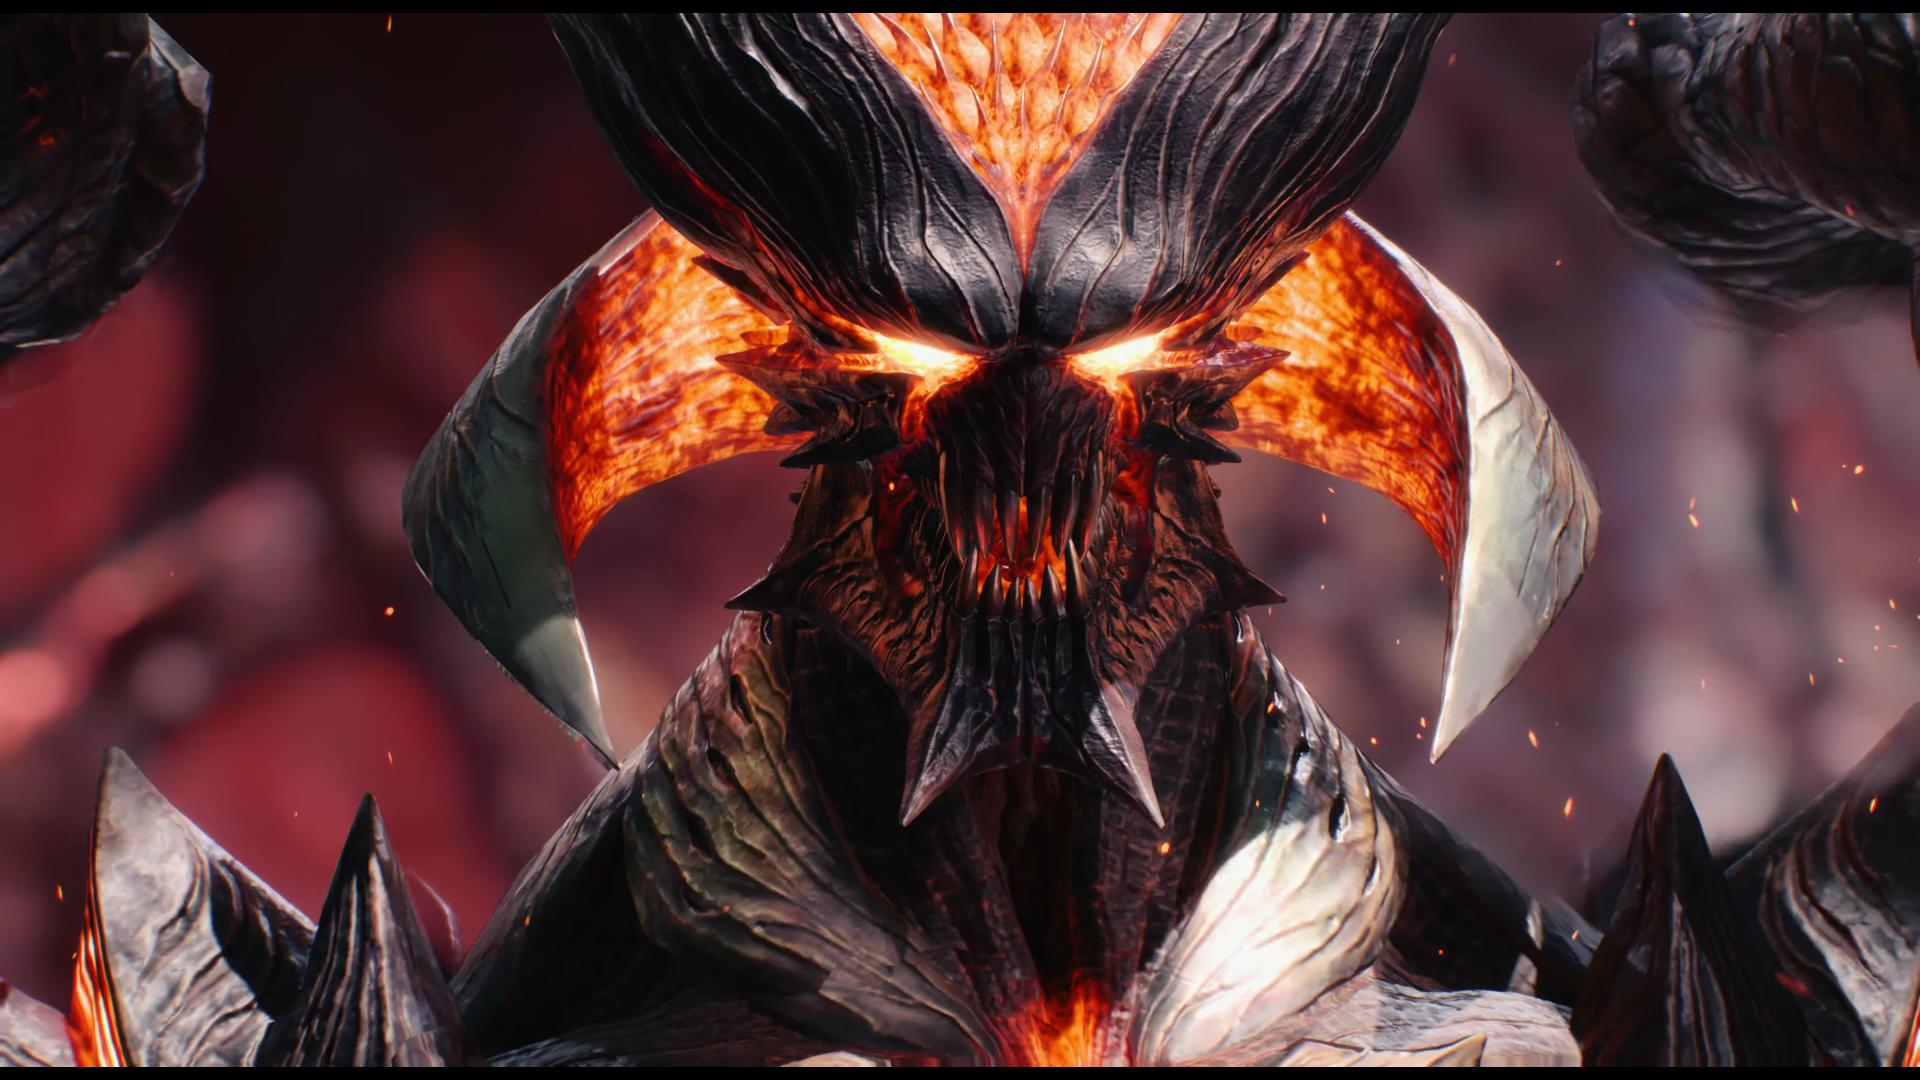 Dante Sin Devil Trigger Hd Wallpaper Background Image